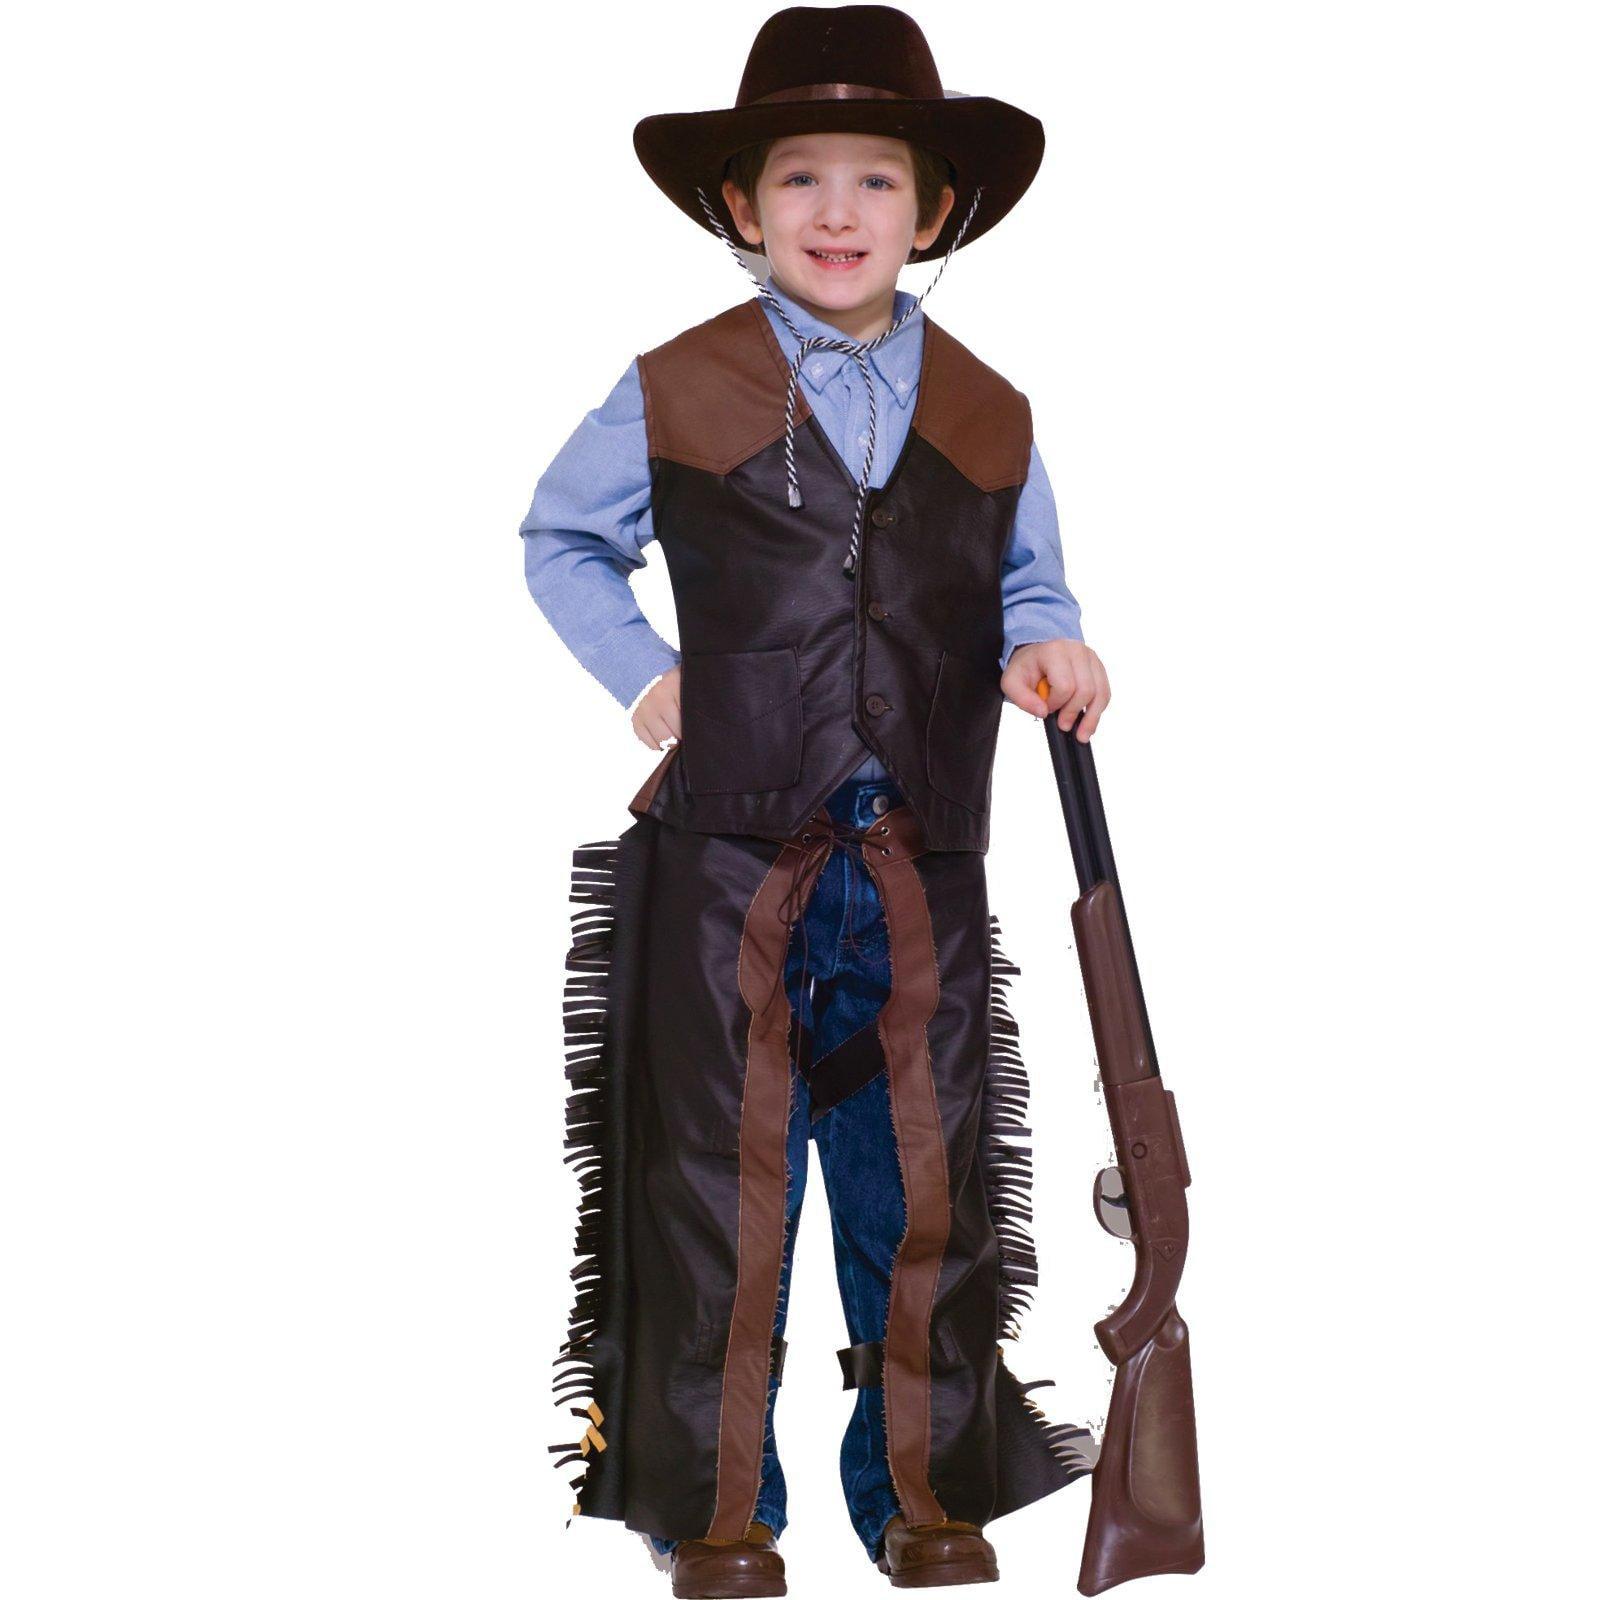 Dress-Up Cowboy Child Costume